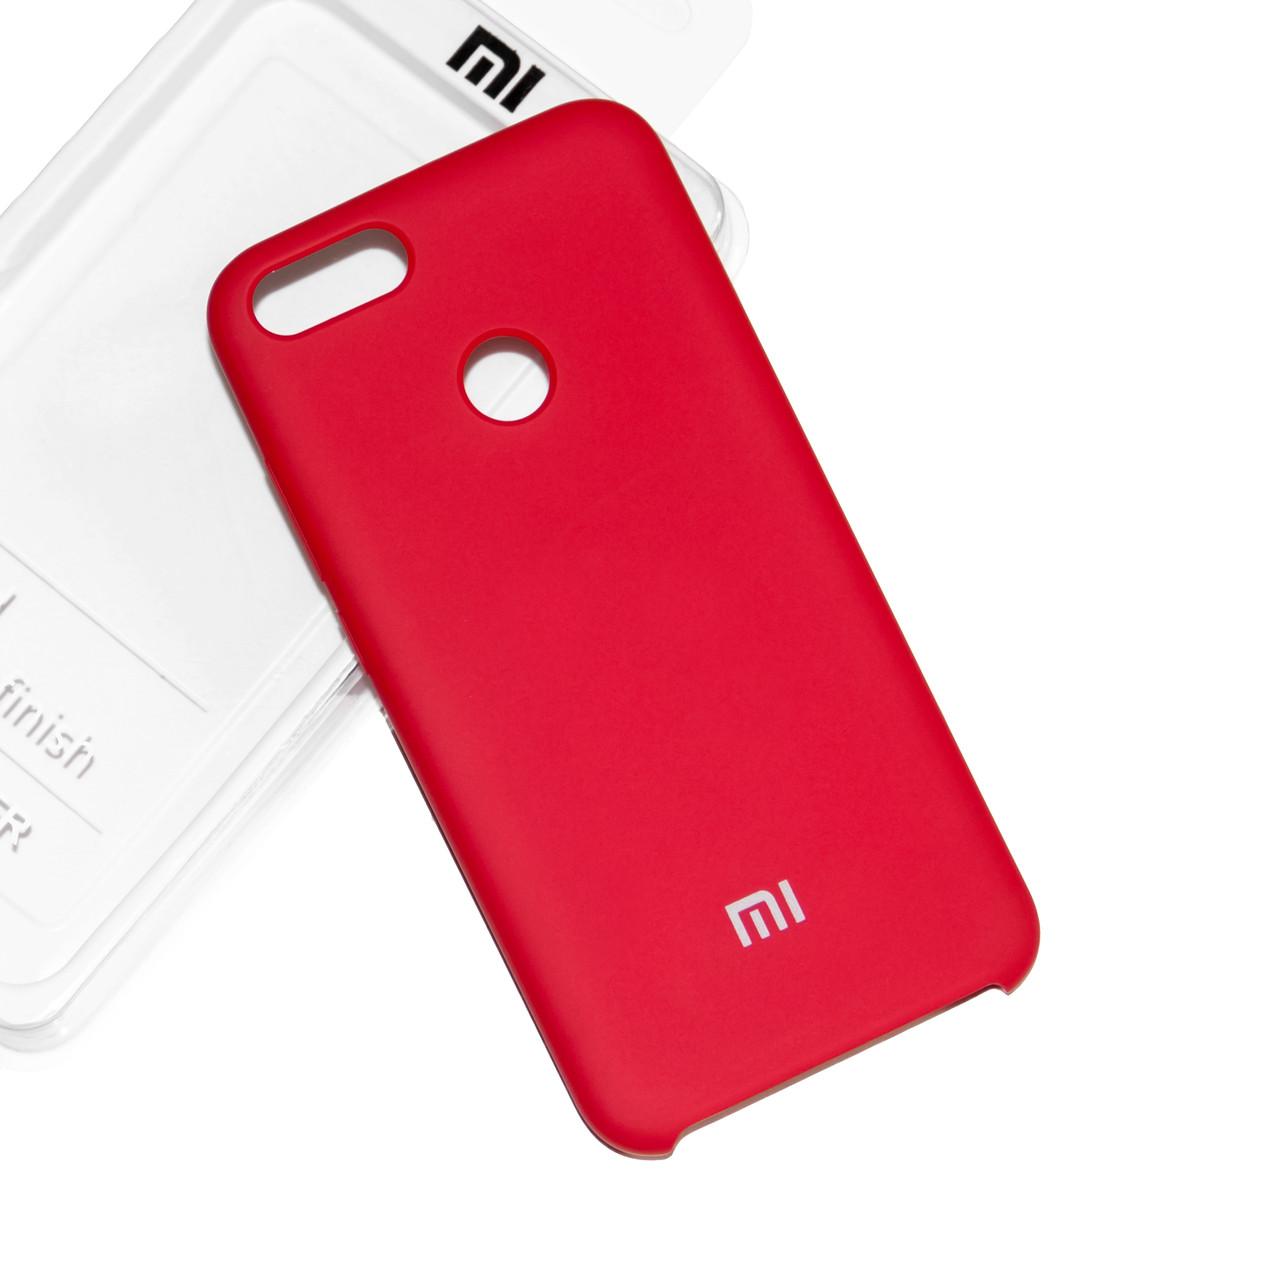 Силиконовый чехол на Xiaomi Mi 5X/ Mi A1 Soft-touch Red